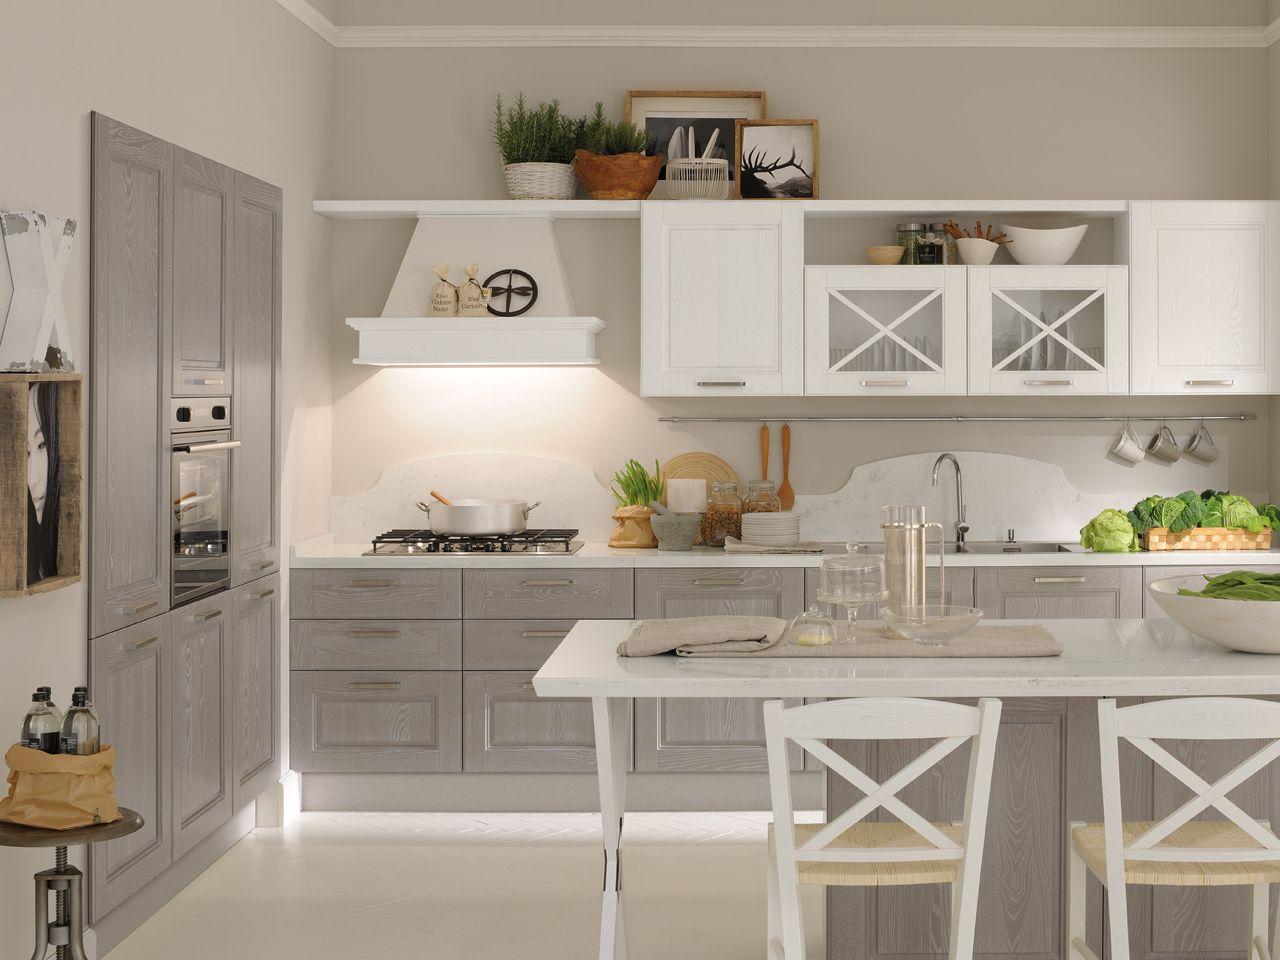 Agnese cucina lube classica cucine ricordi e amici for Cucina agnese lube